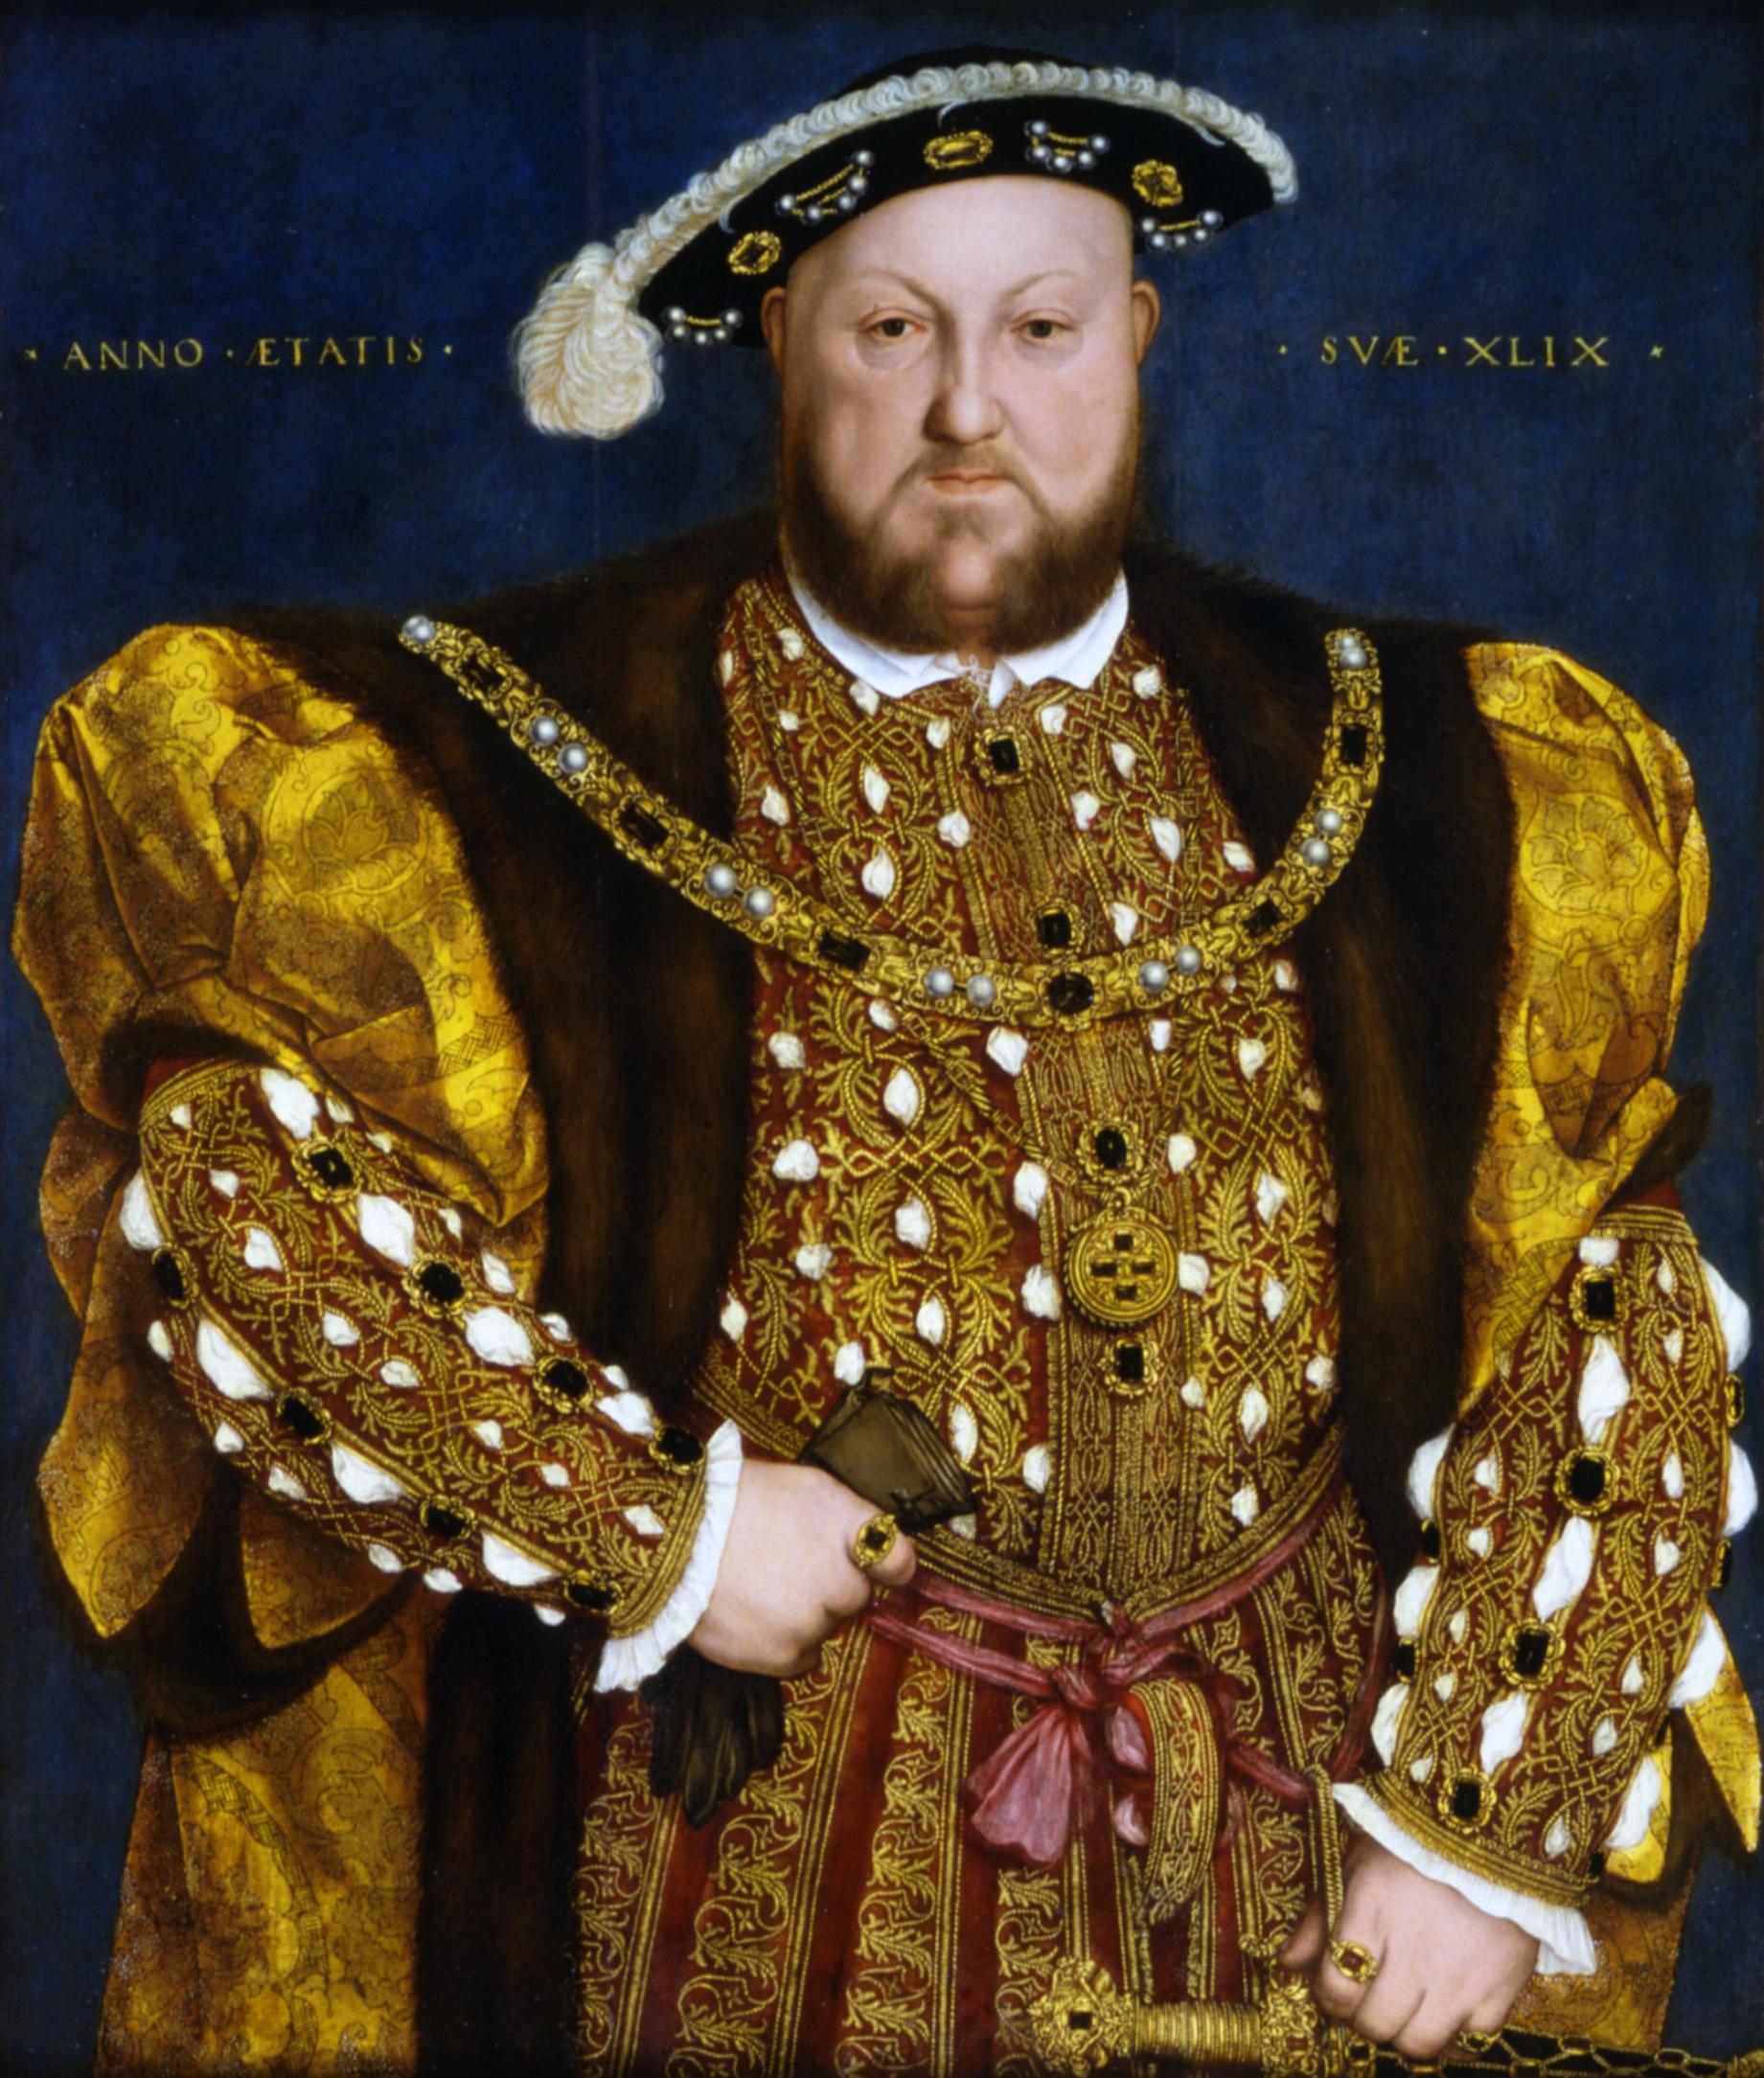 короли и королевы англии хронология